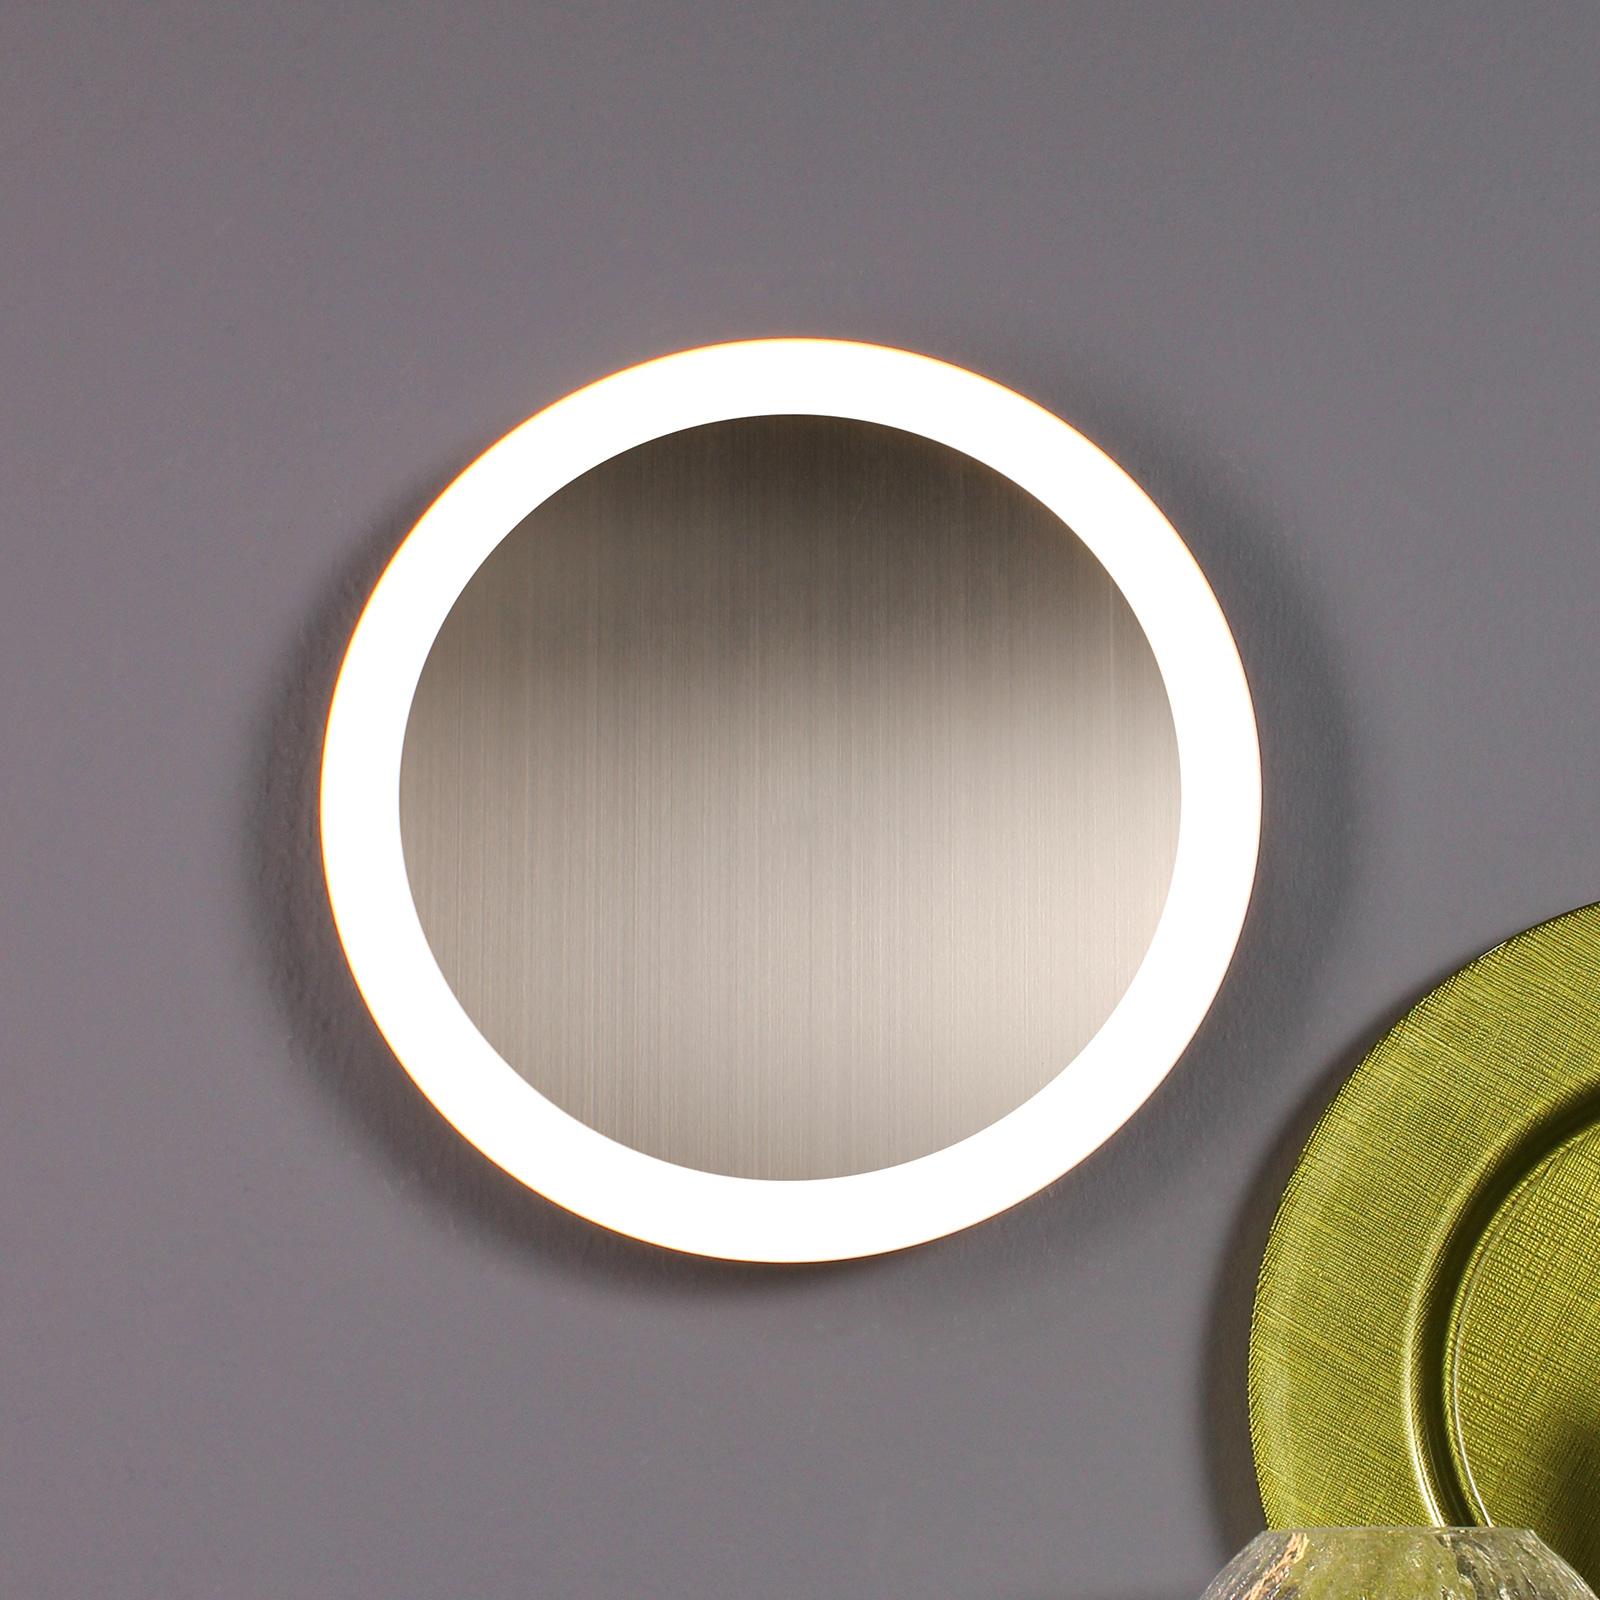 Lampa sufitowa LED Moon Ø 40 cm, srebrna